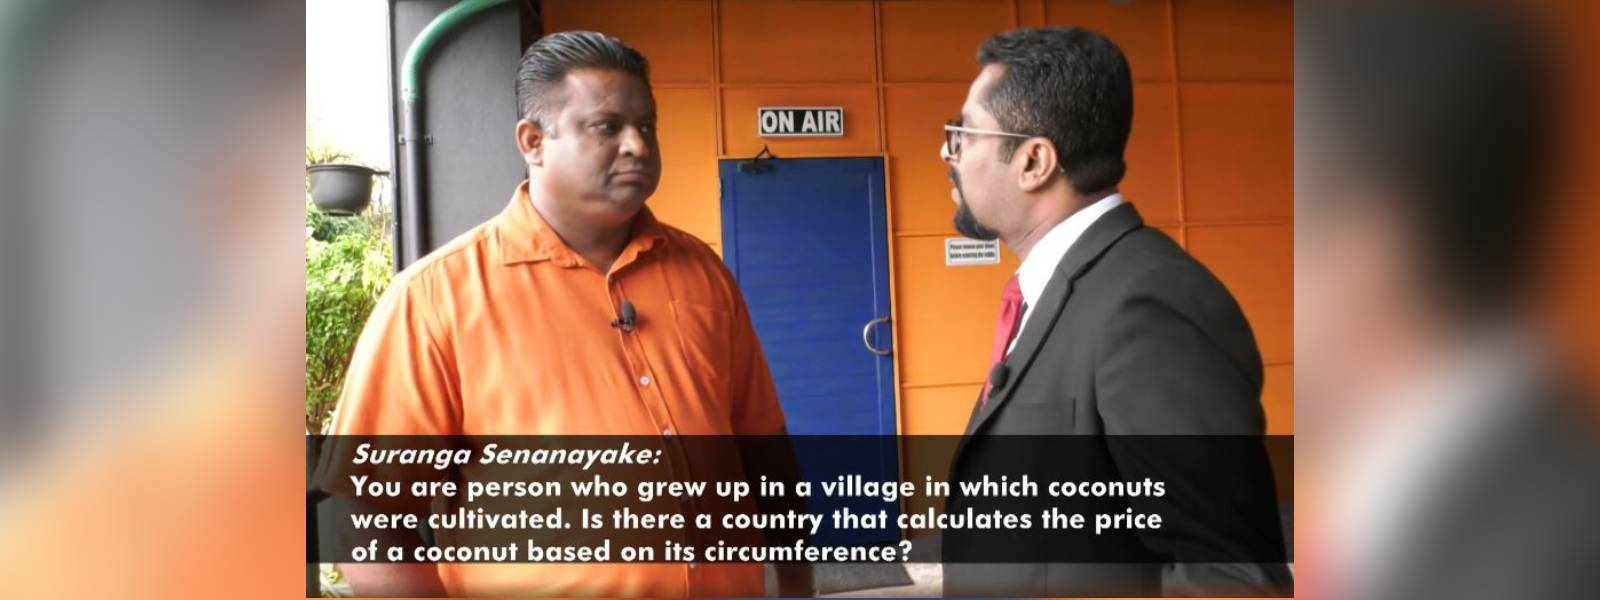 Business community must be informed of coconut pricing mechanism: Arundika